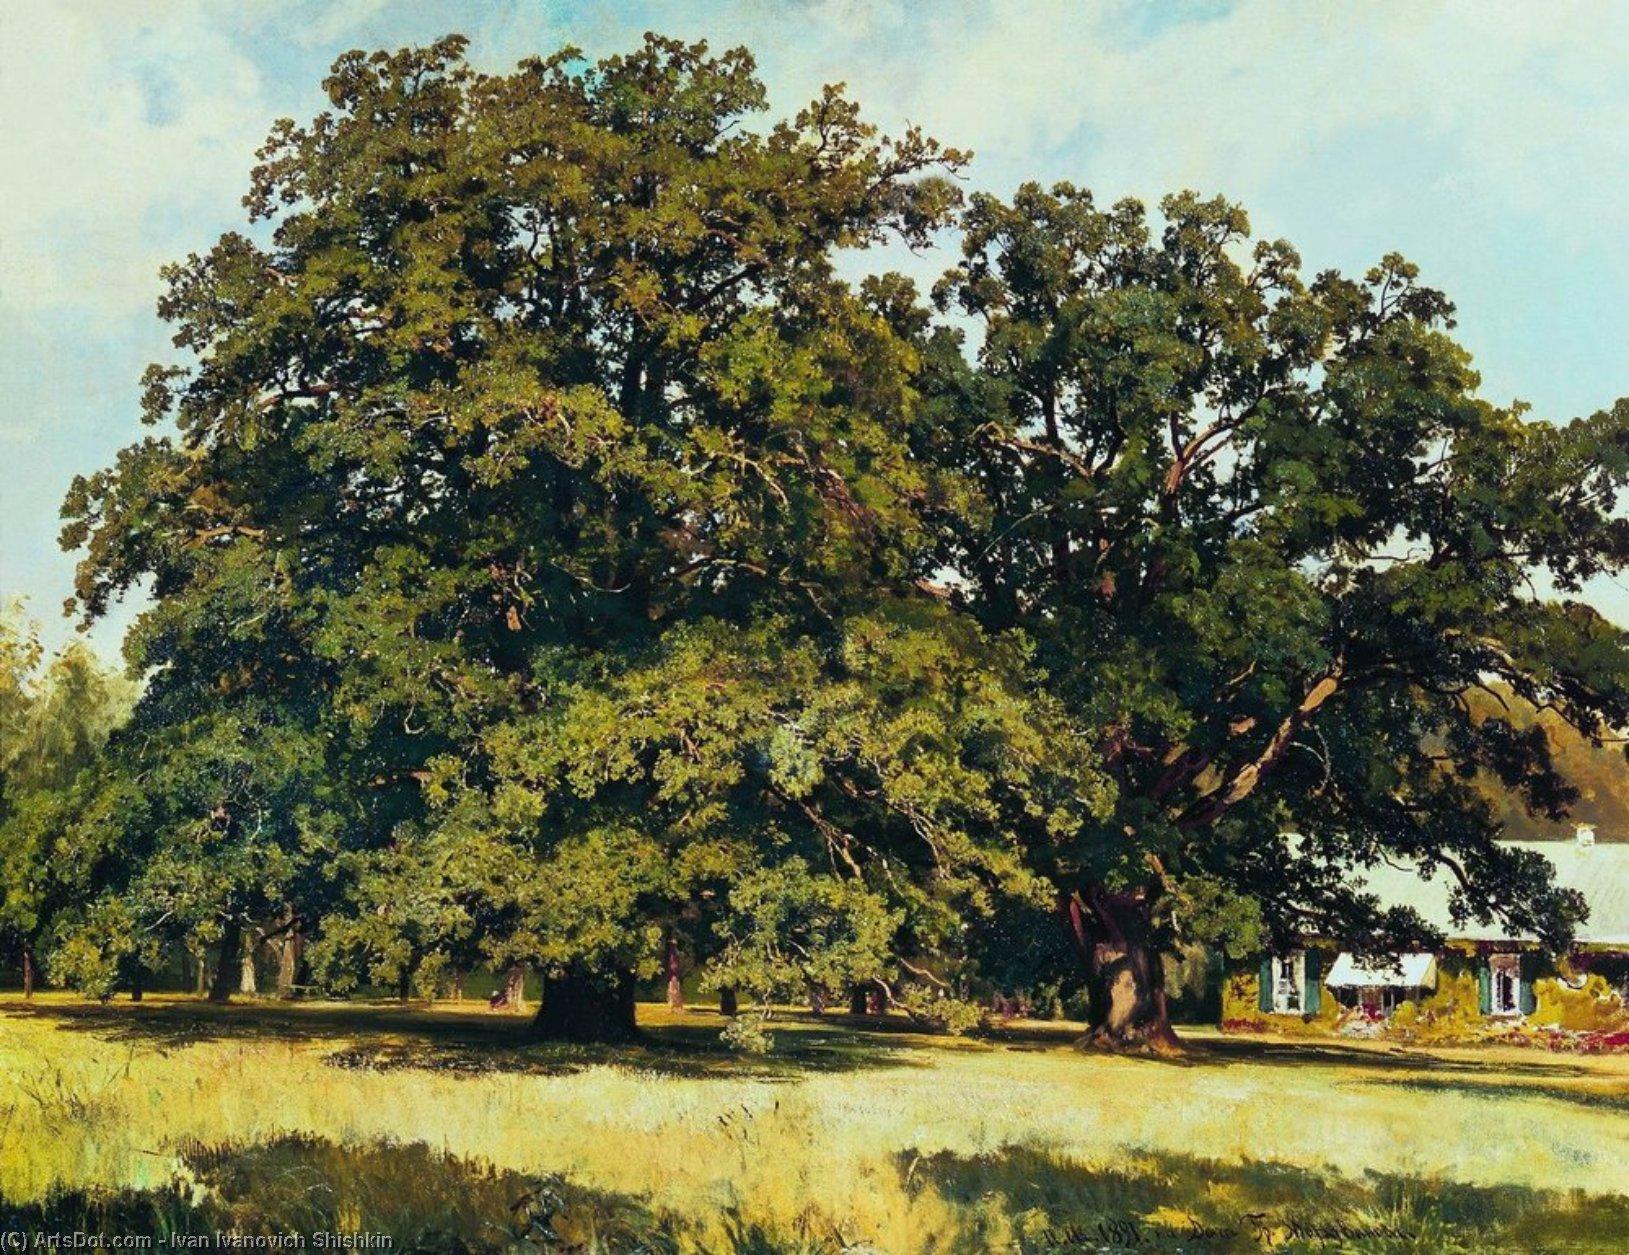 WikiOO.org - Encyclopedia of Fine Arts - Schilderen, Artwork Ivan Ivanovich Shishkin - The Mordvinovo Oaks